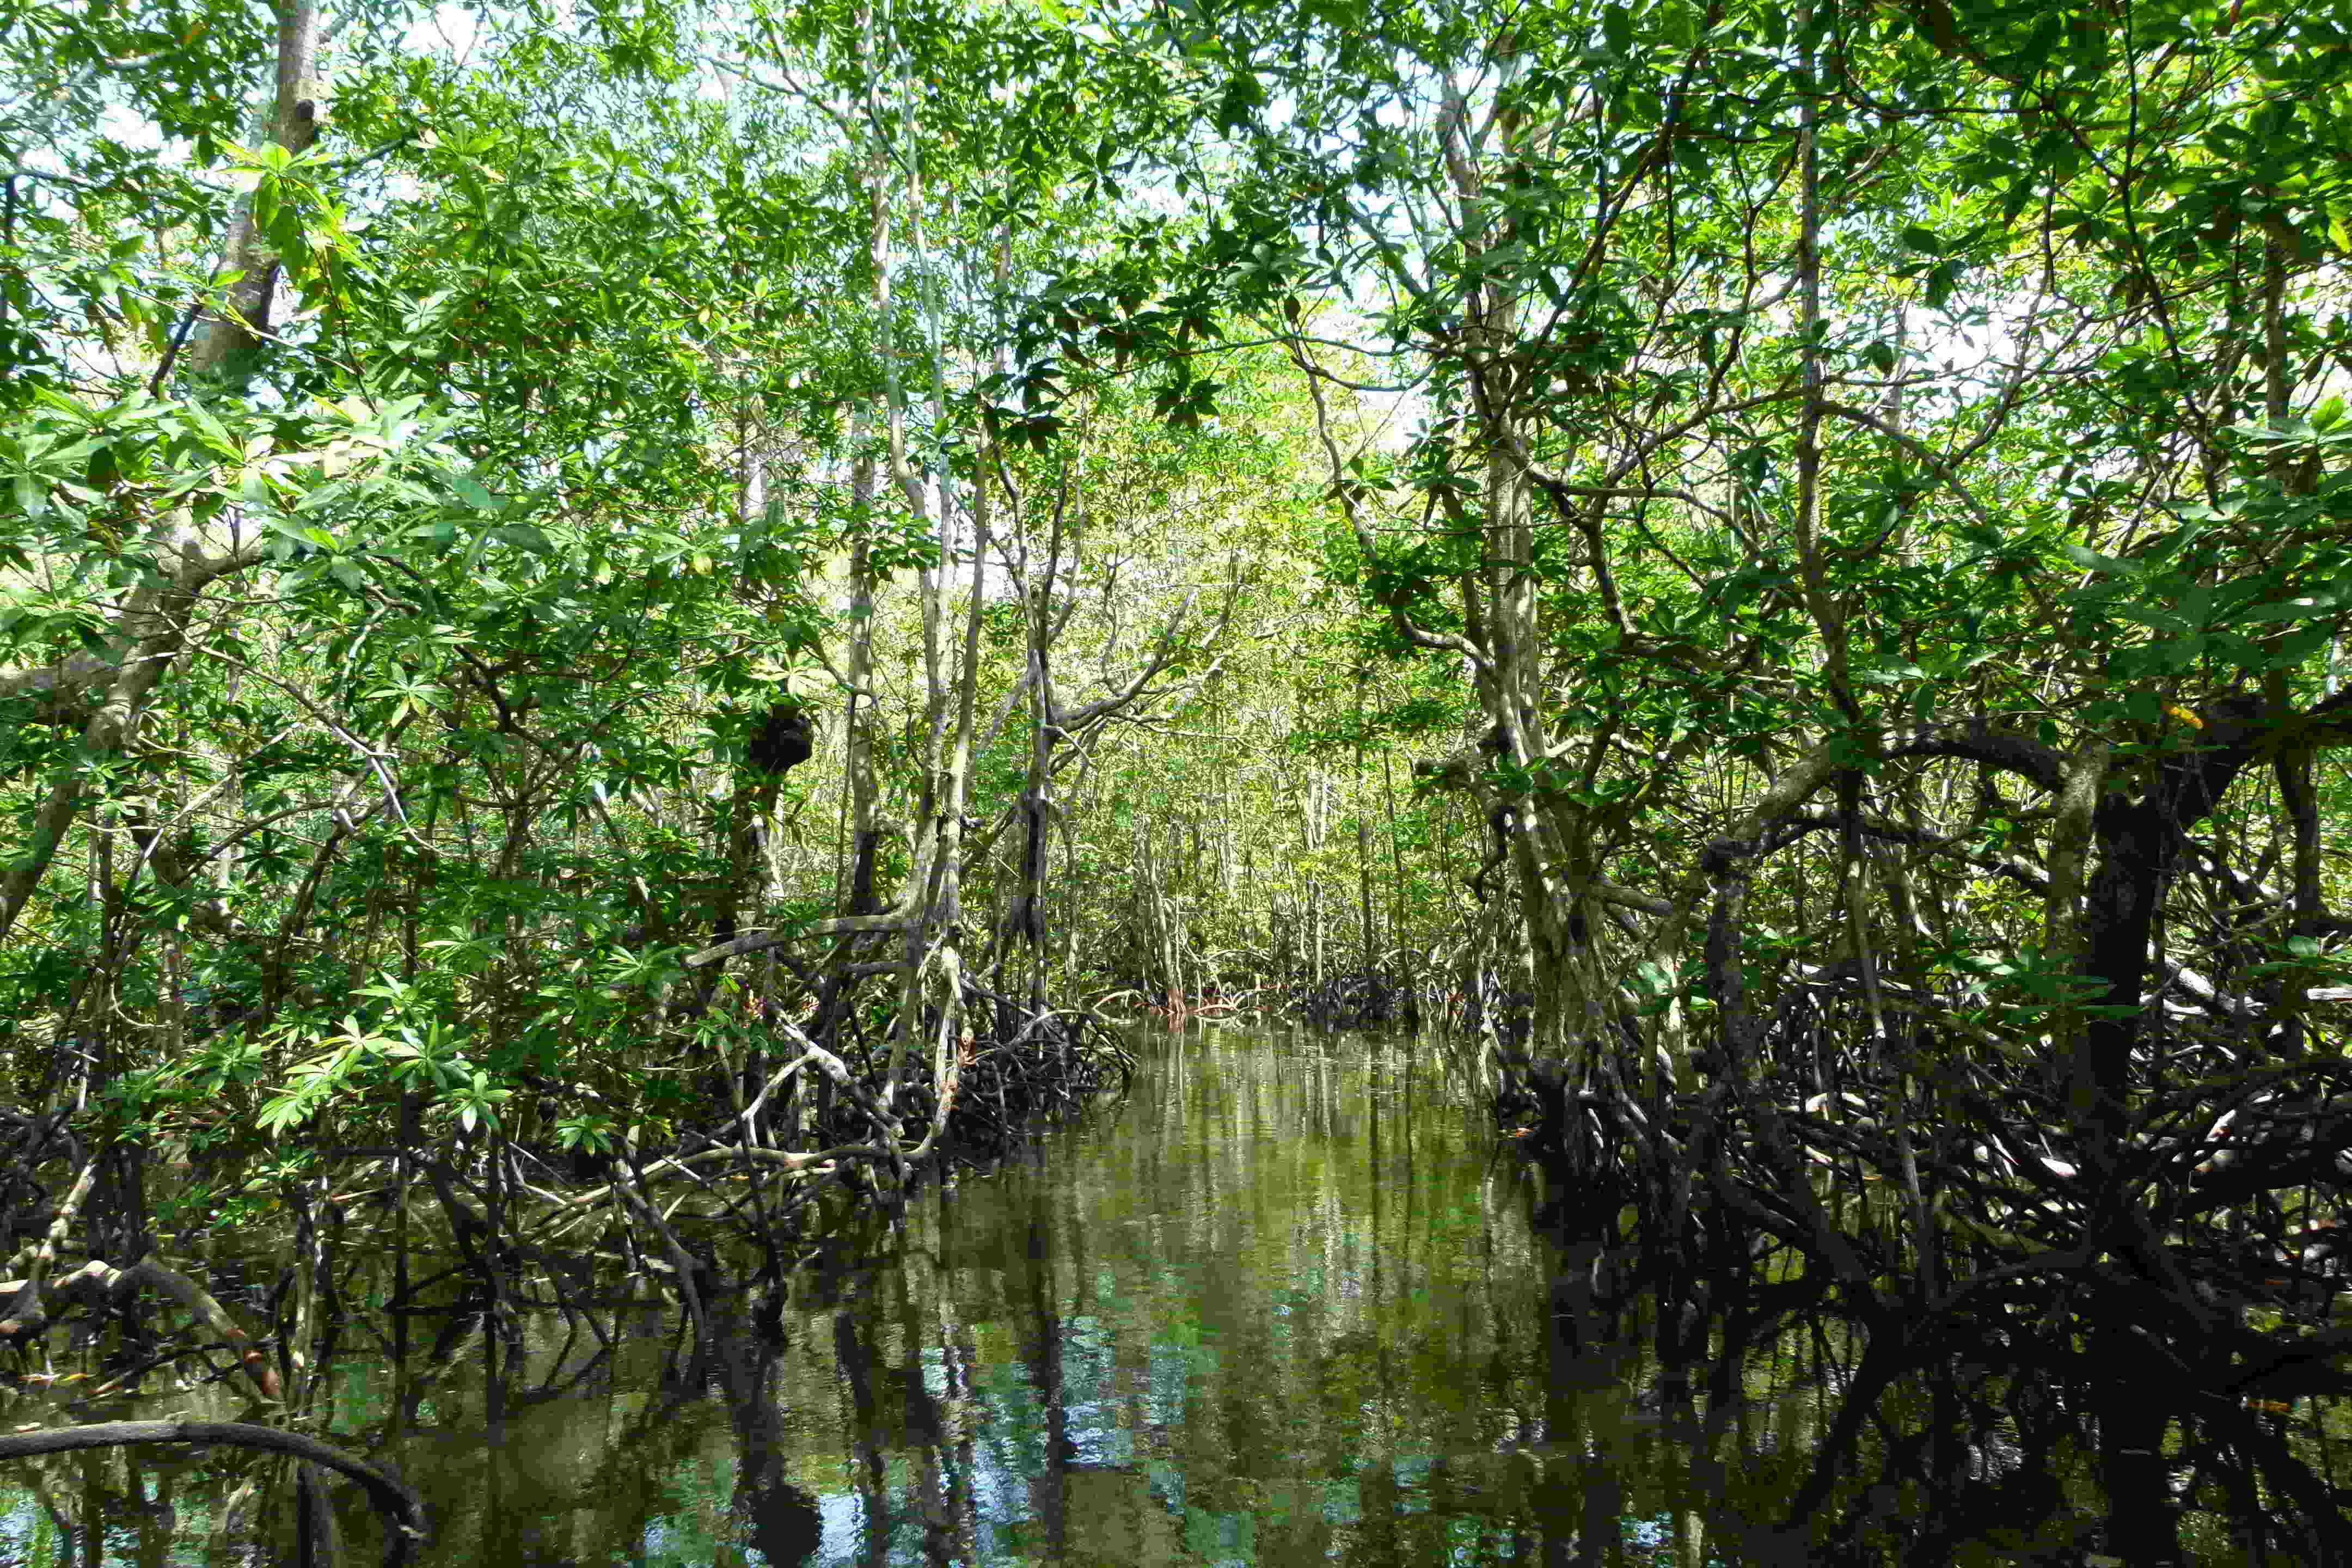 kokomana-kokopelli-logo-restaurant-sierpe-ballena-tales-osa-enjoy-tours-puravida-nature-iguana-nature-monkey-mangrove